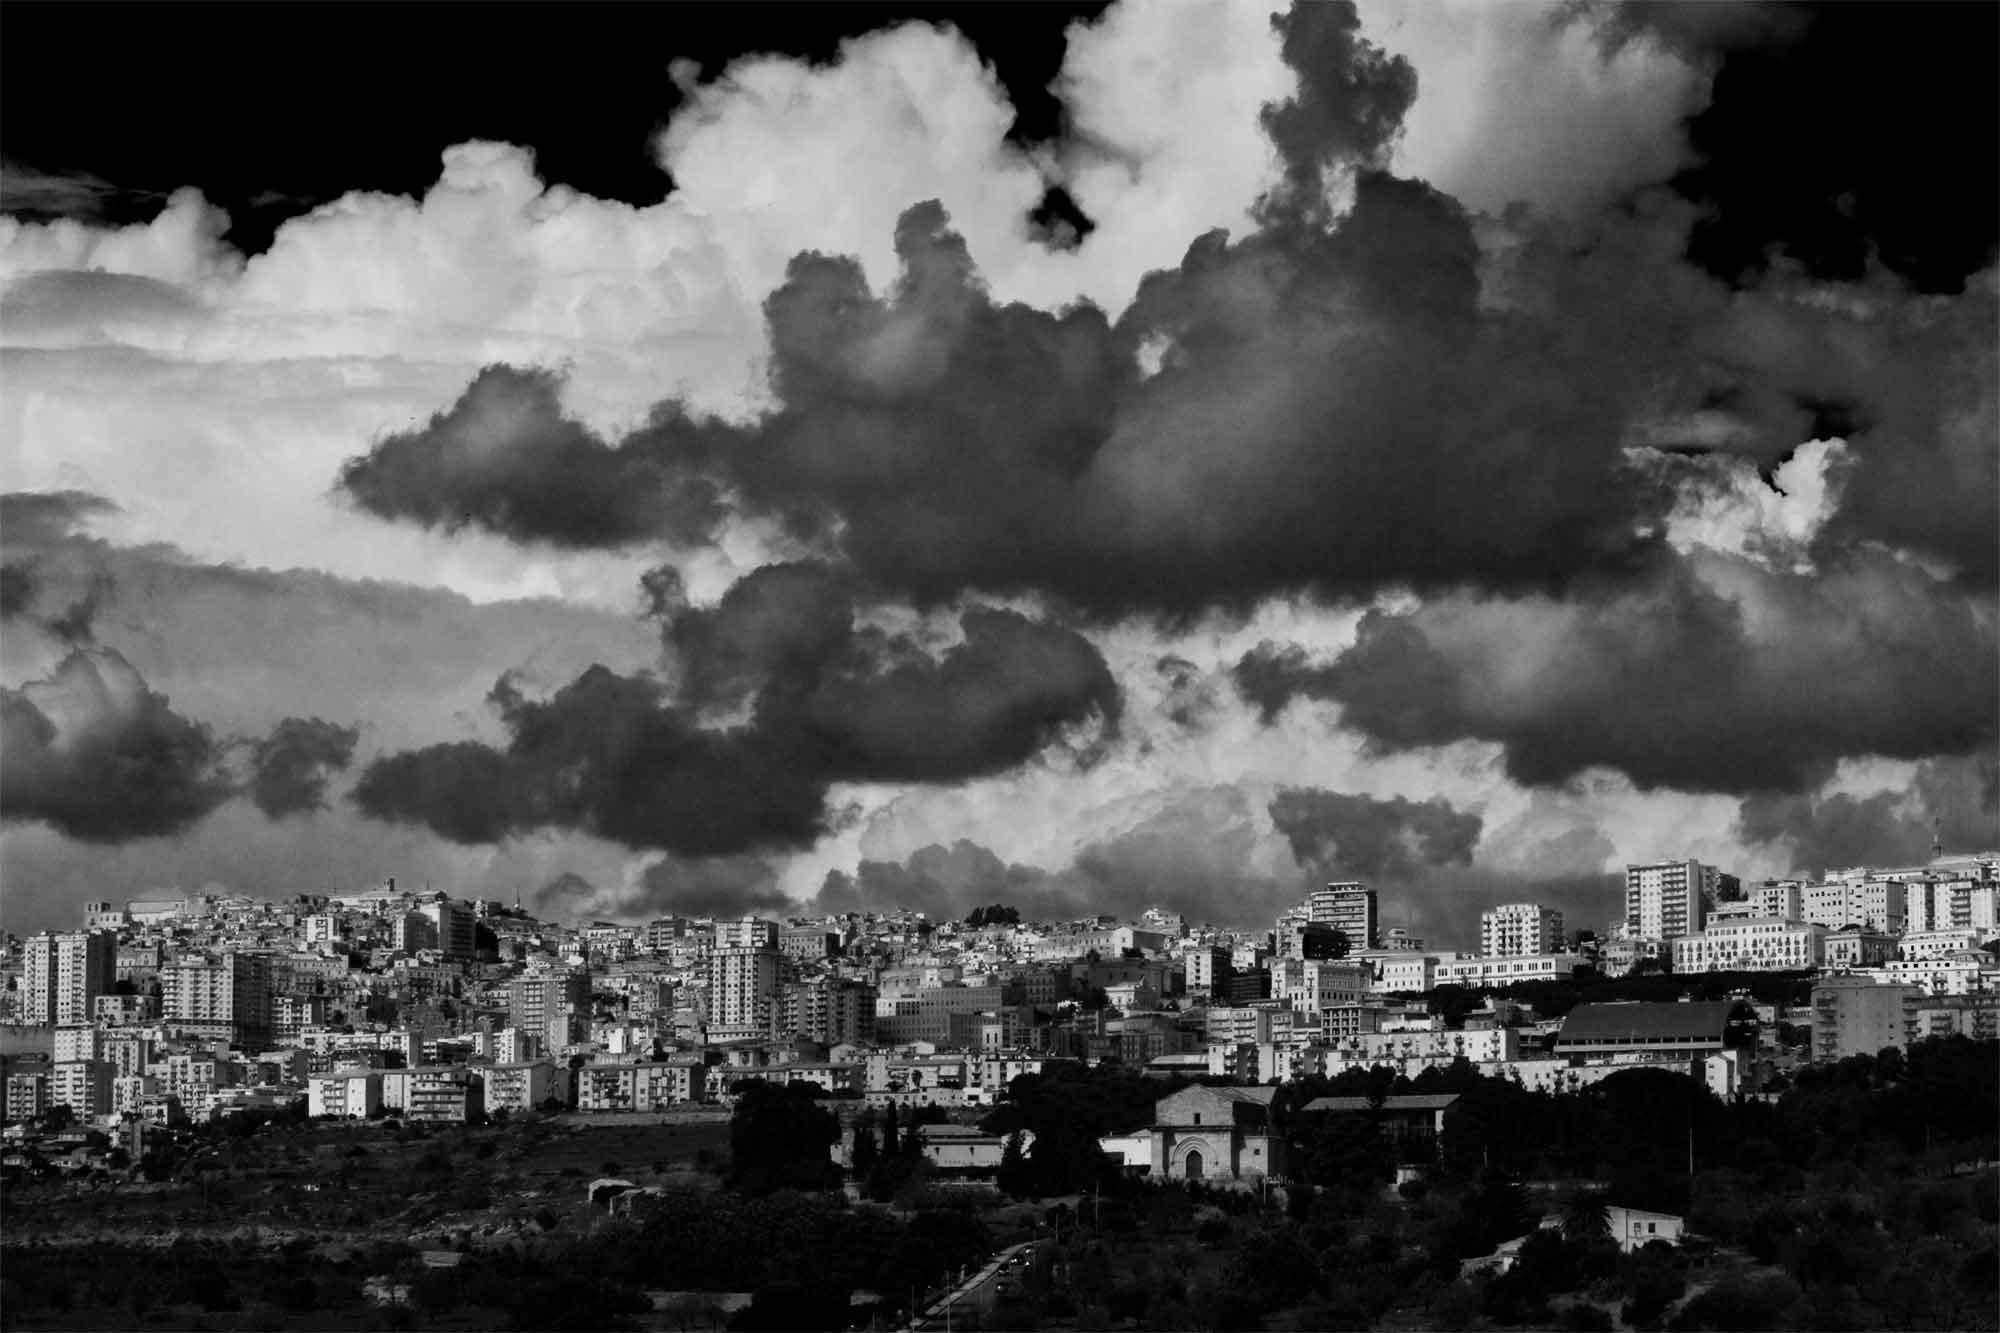 Agrigent, Sizilien: Stadtblick mit Wolkenformation